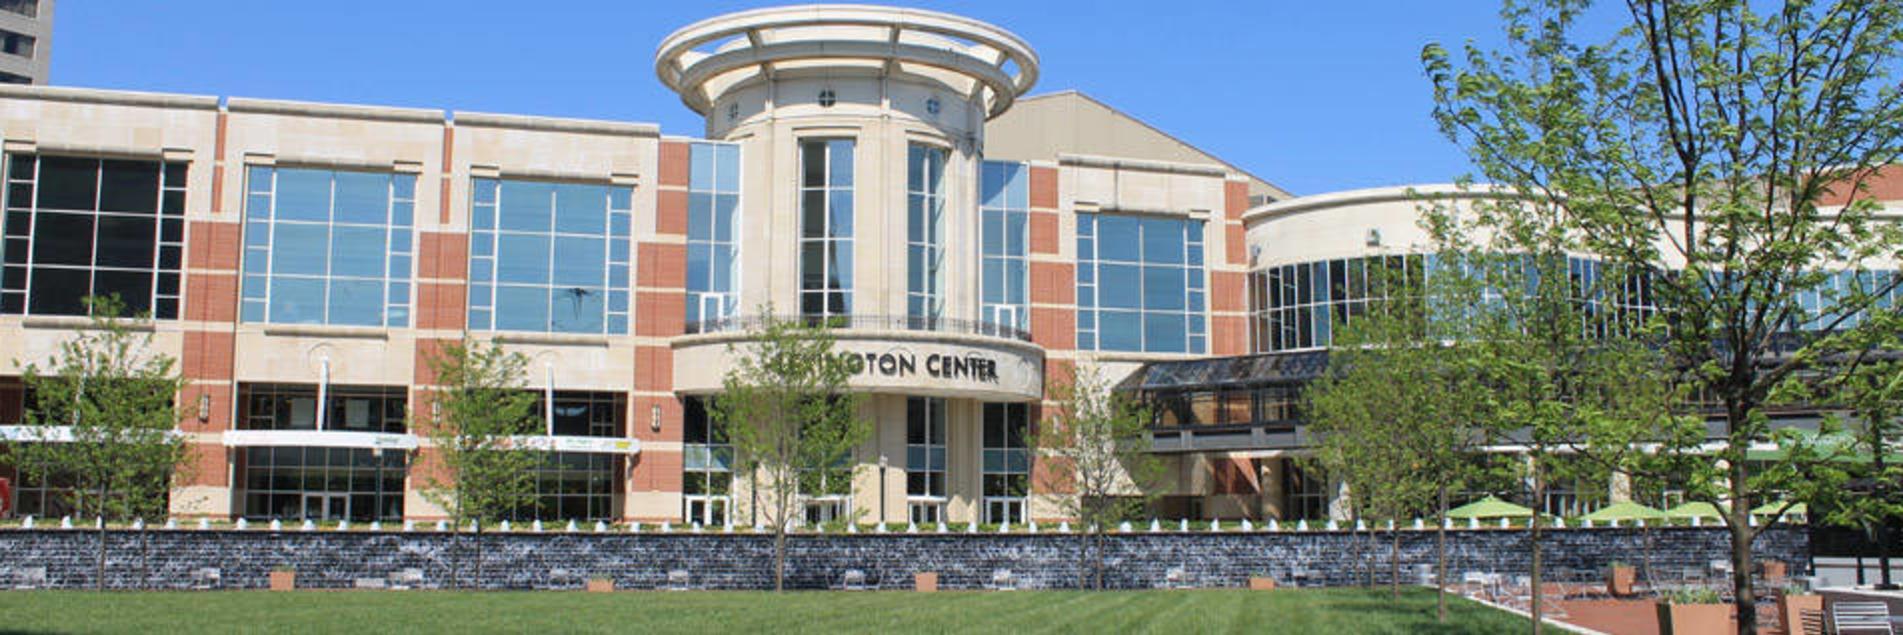 Lexington Center - Banner